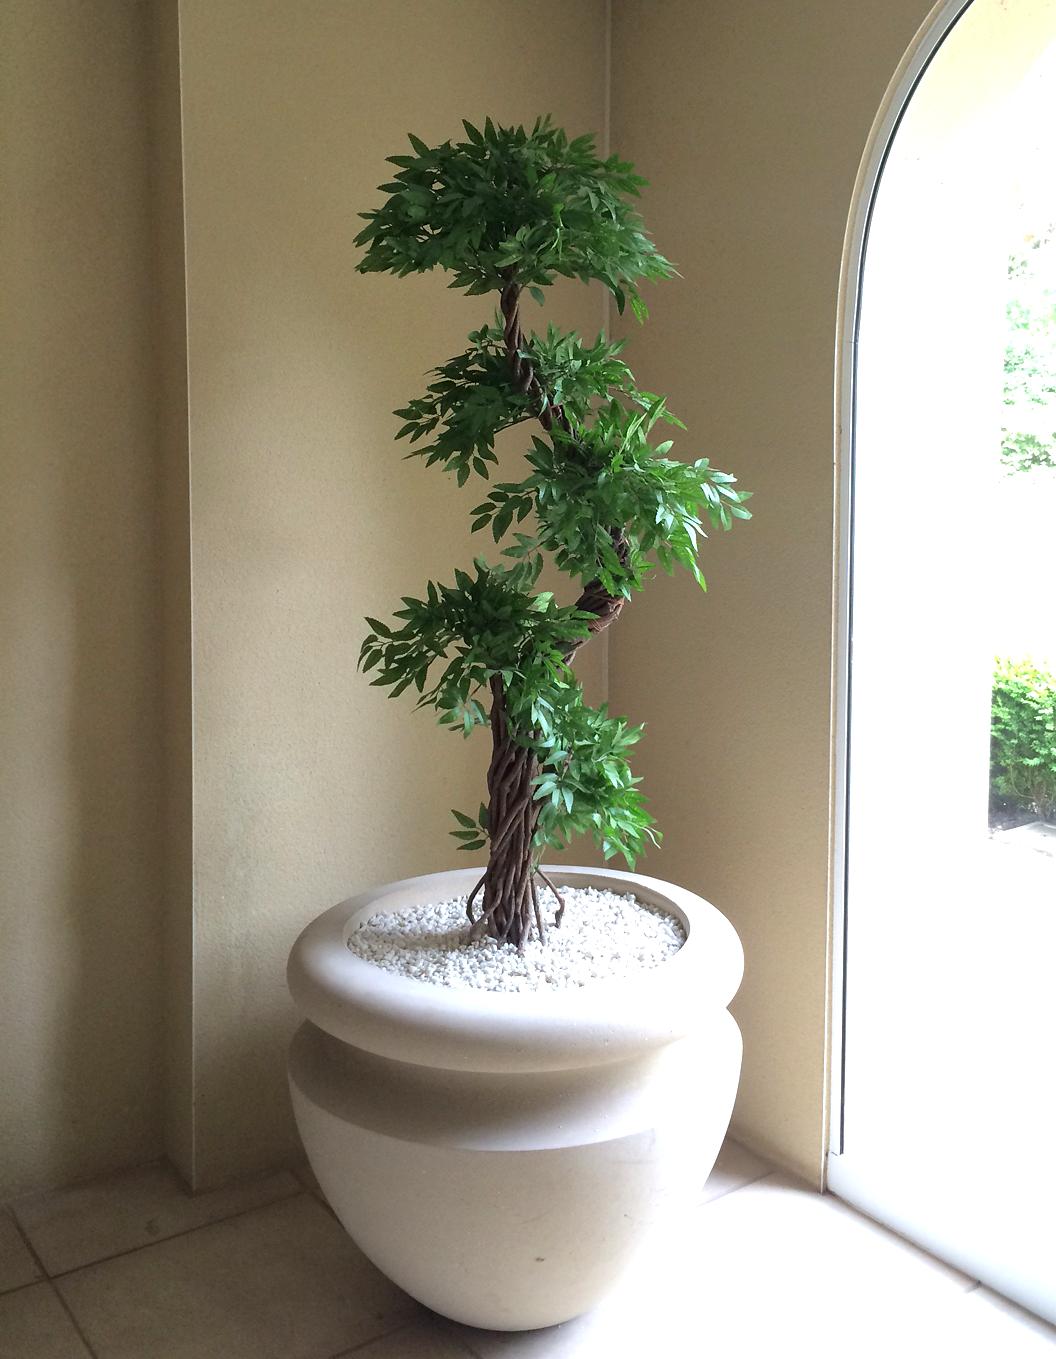 Wallpapers Unlimited: Beautiful Japanese Bonsai Trees |Beautiful Japanese Trees